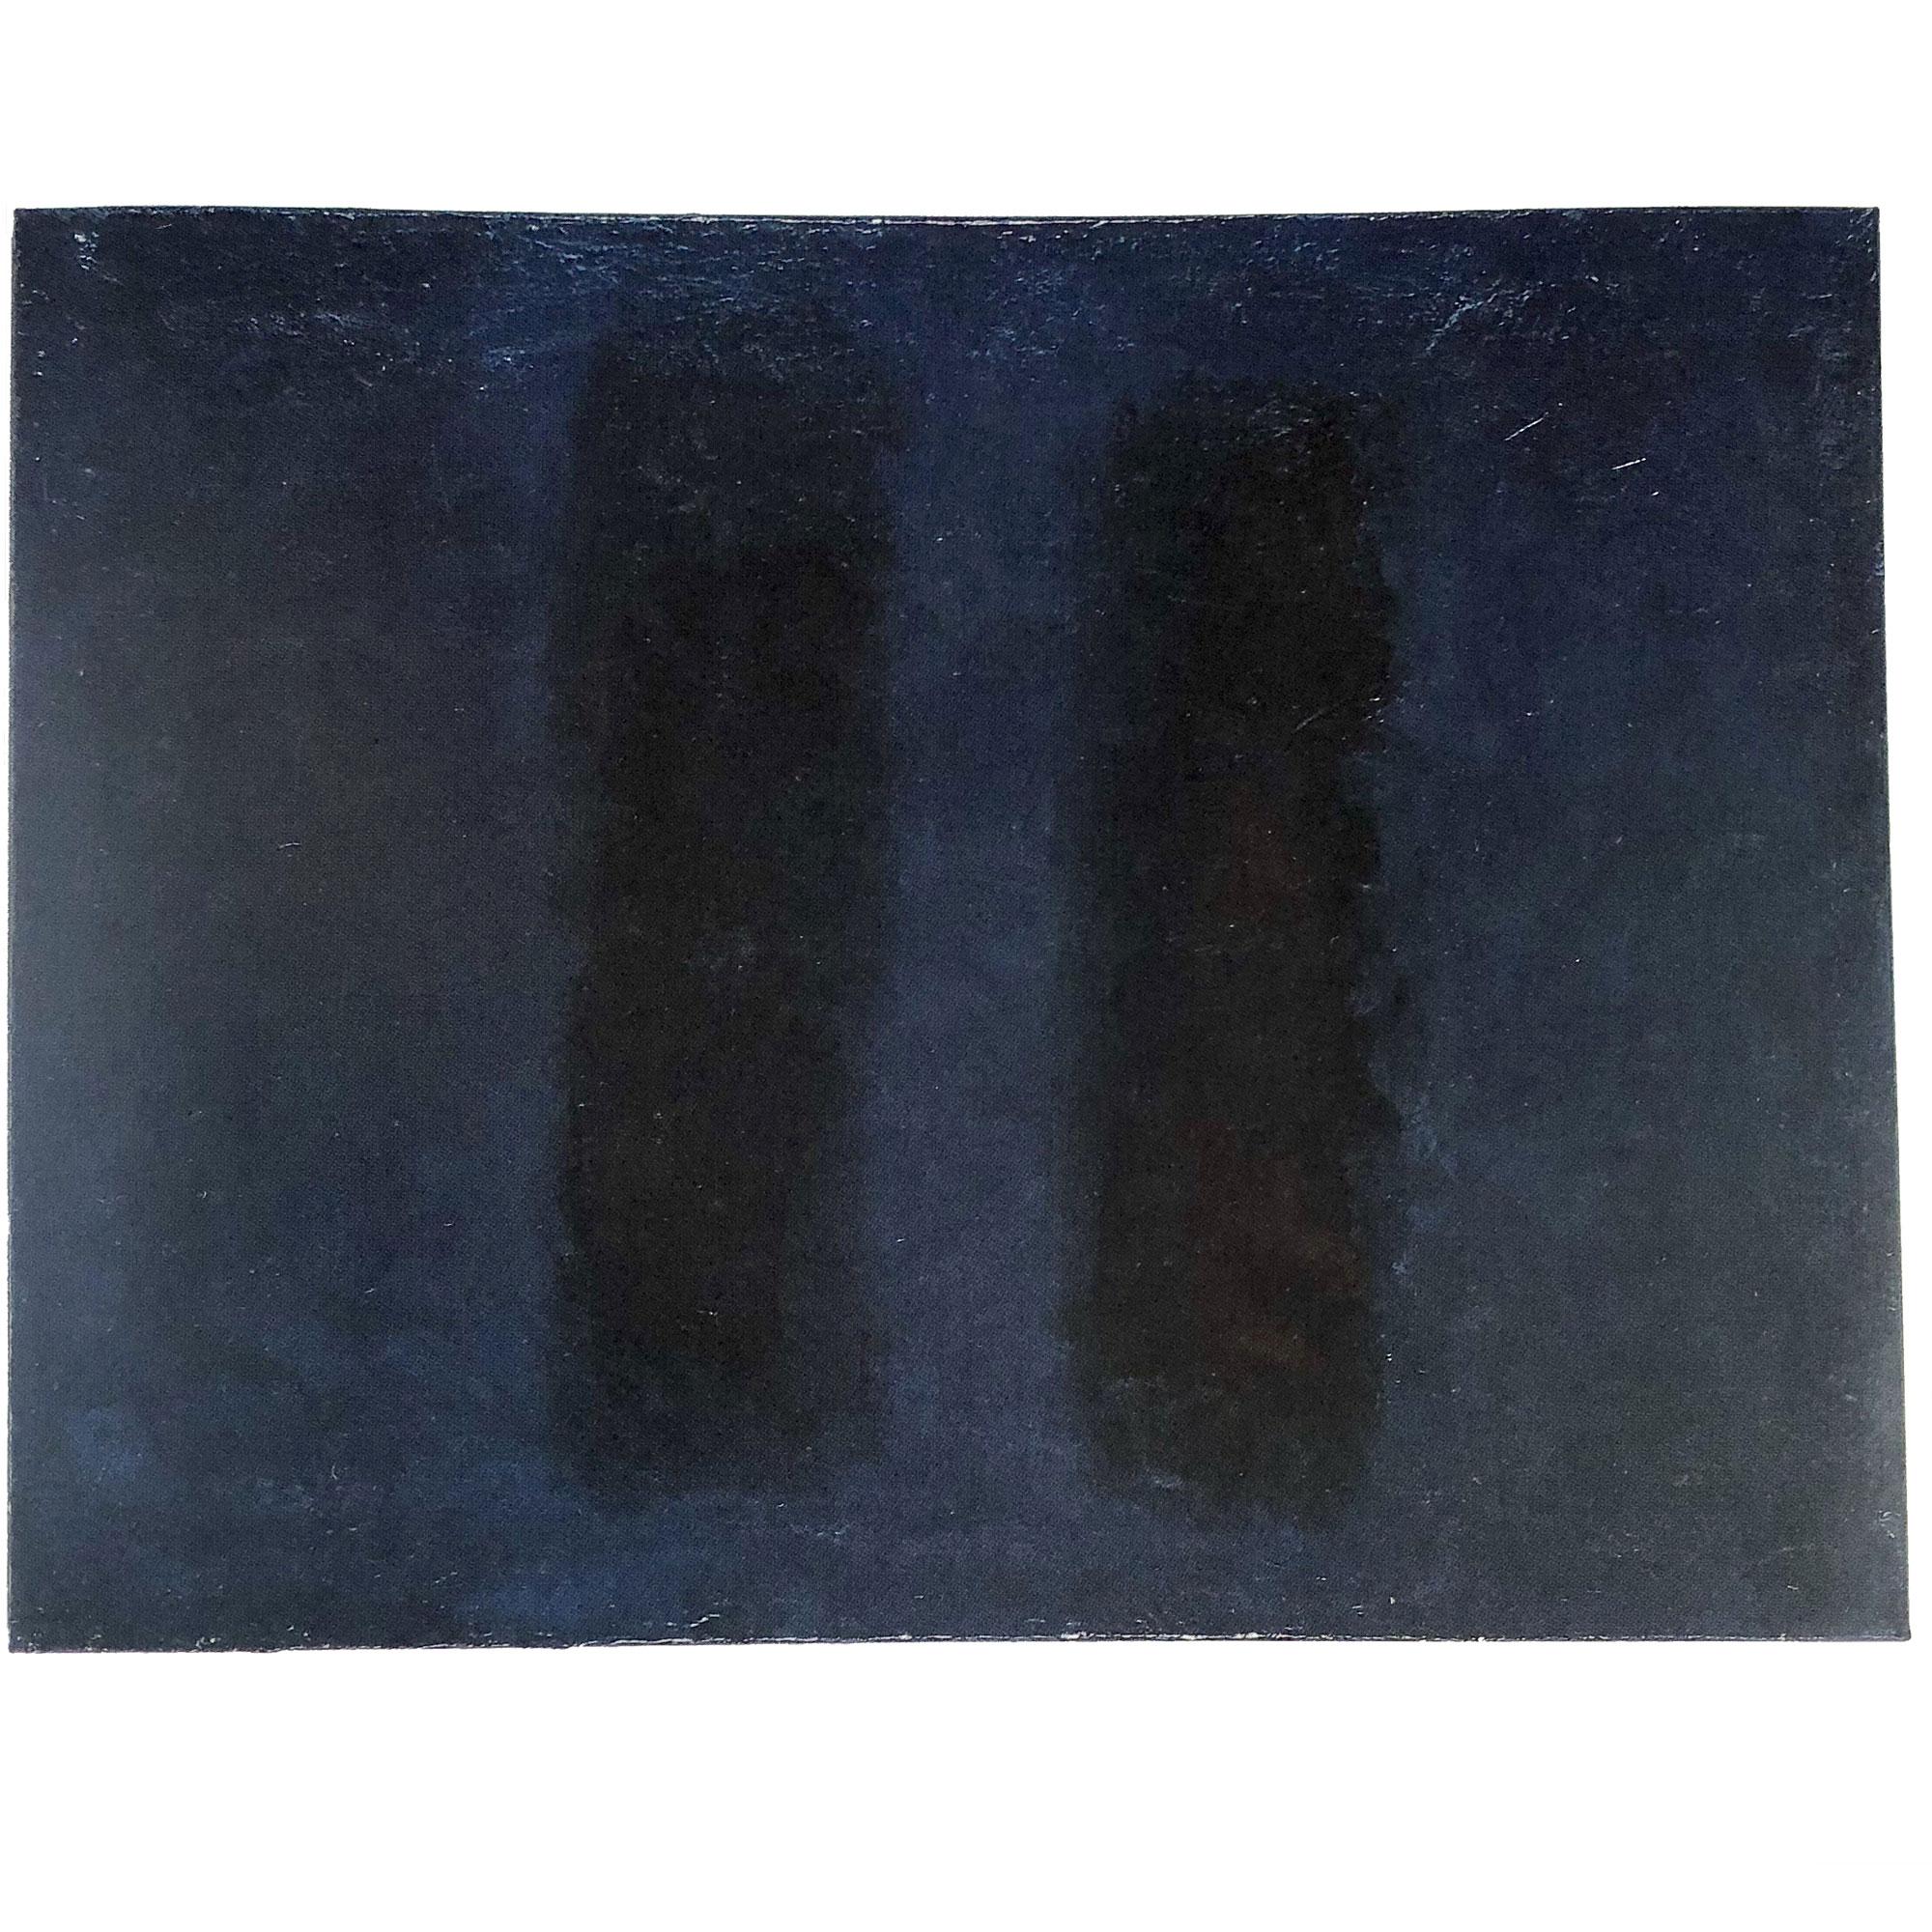 Monochrom-ohne-Titel-7-Öl-auf-Leinwand-80×60-1995